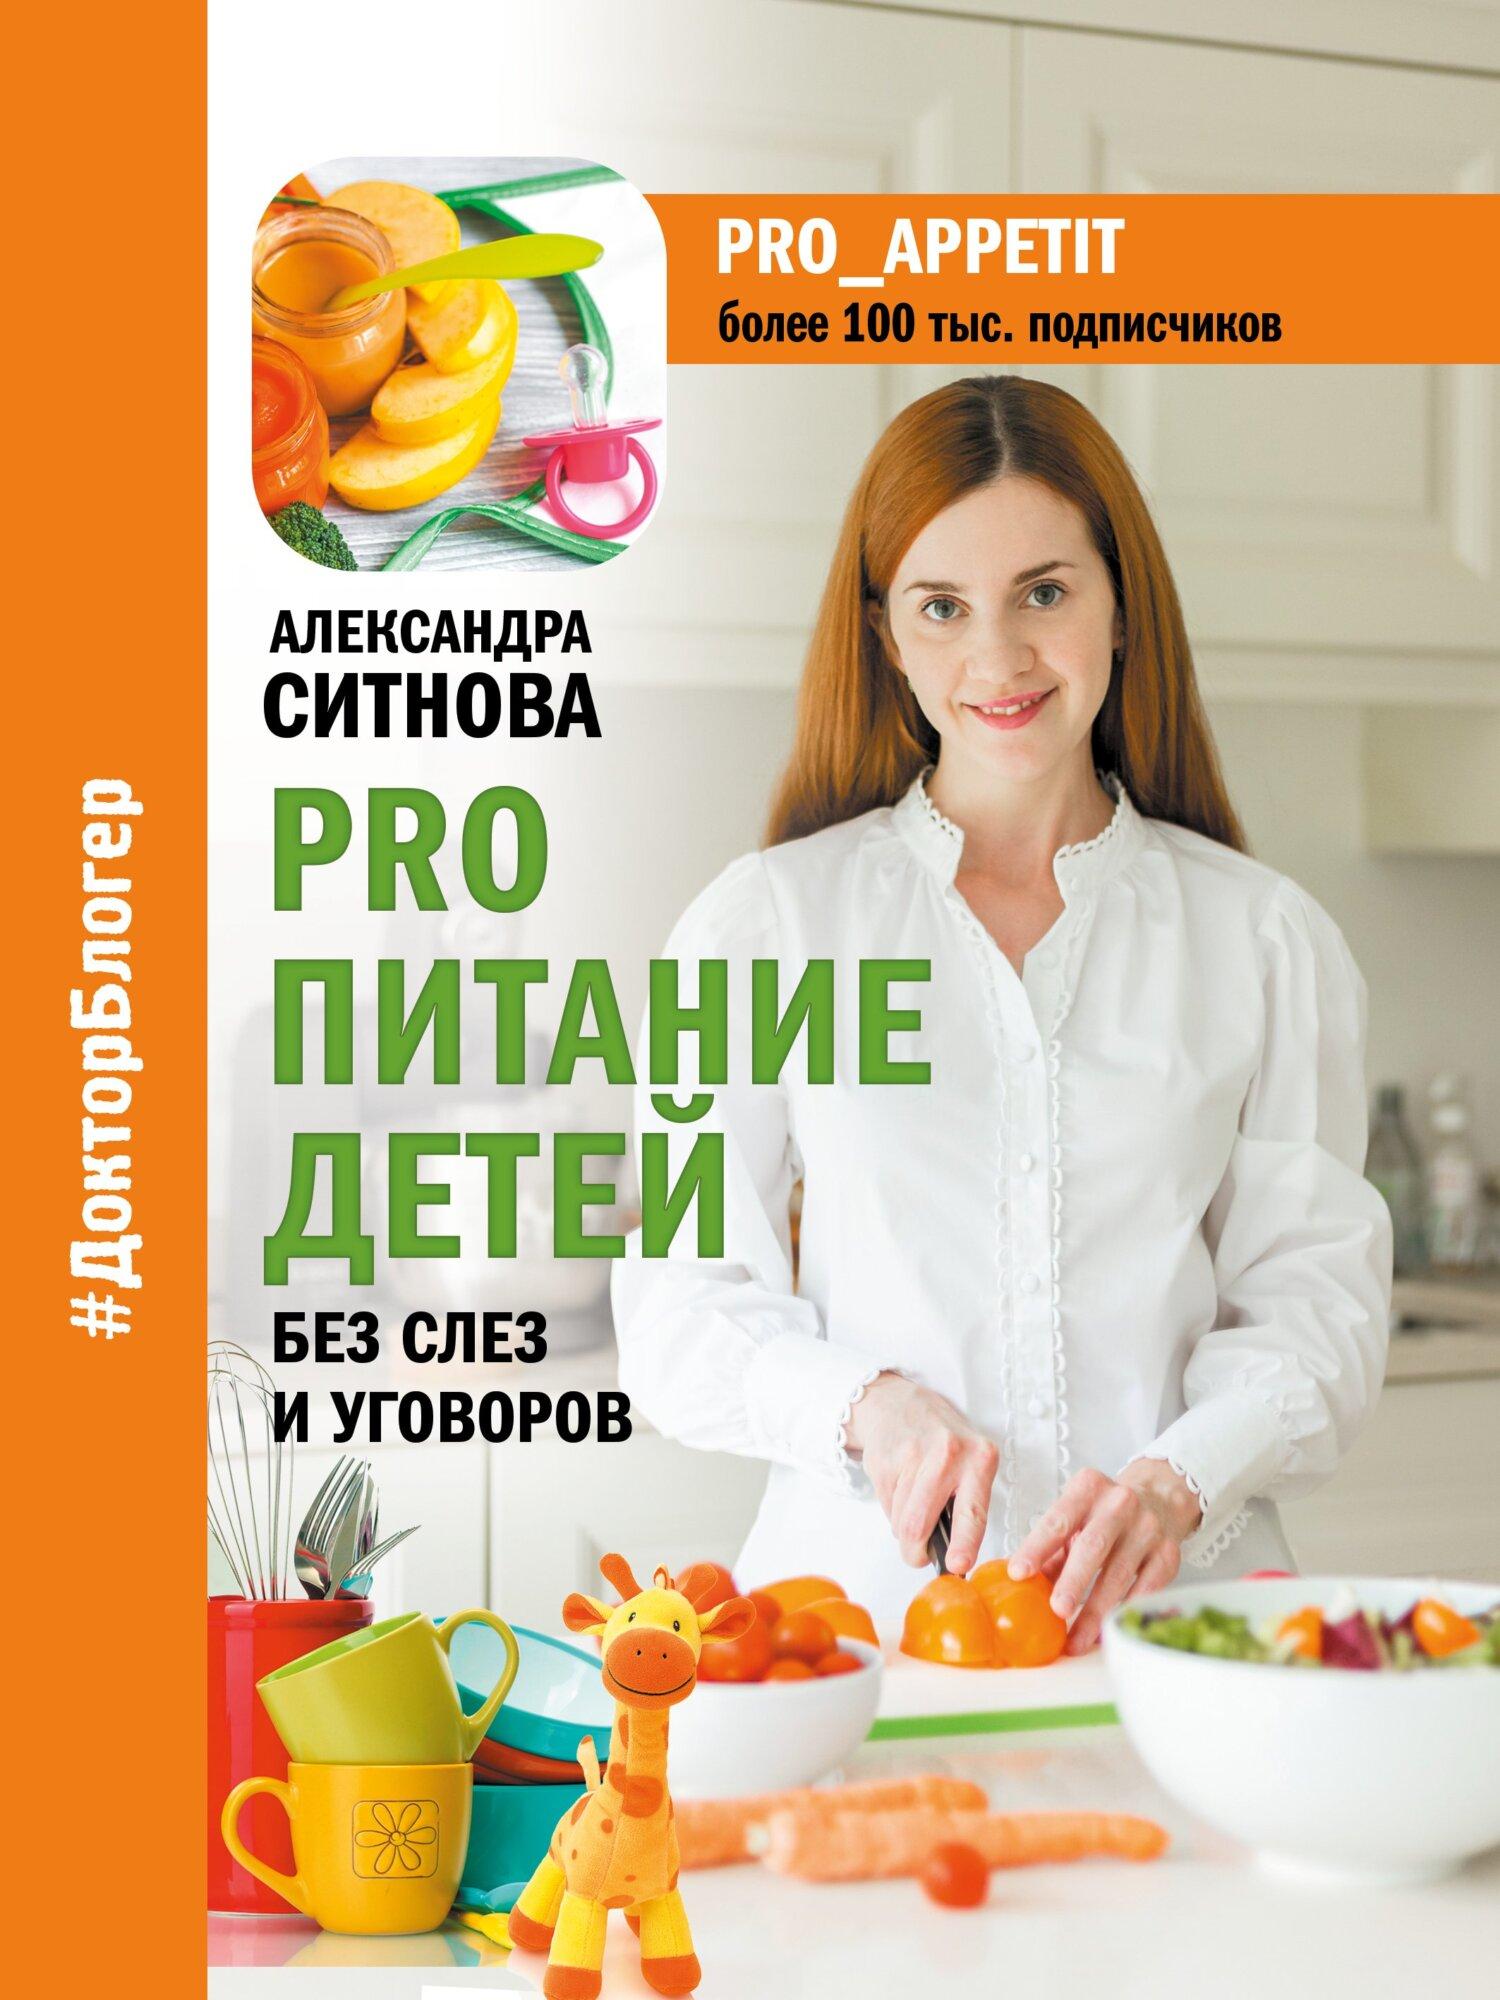 Александра Ситнова PRO питание детей. Без слез и уговоров